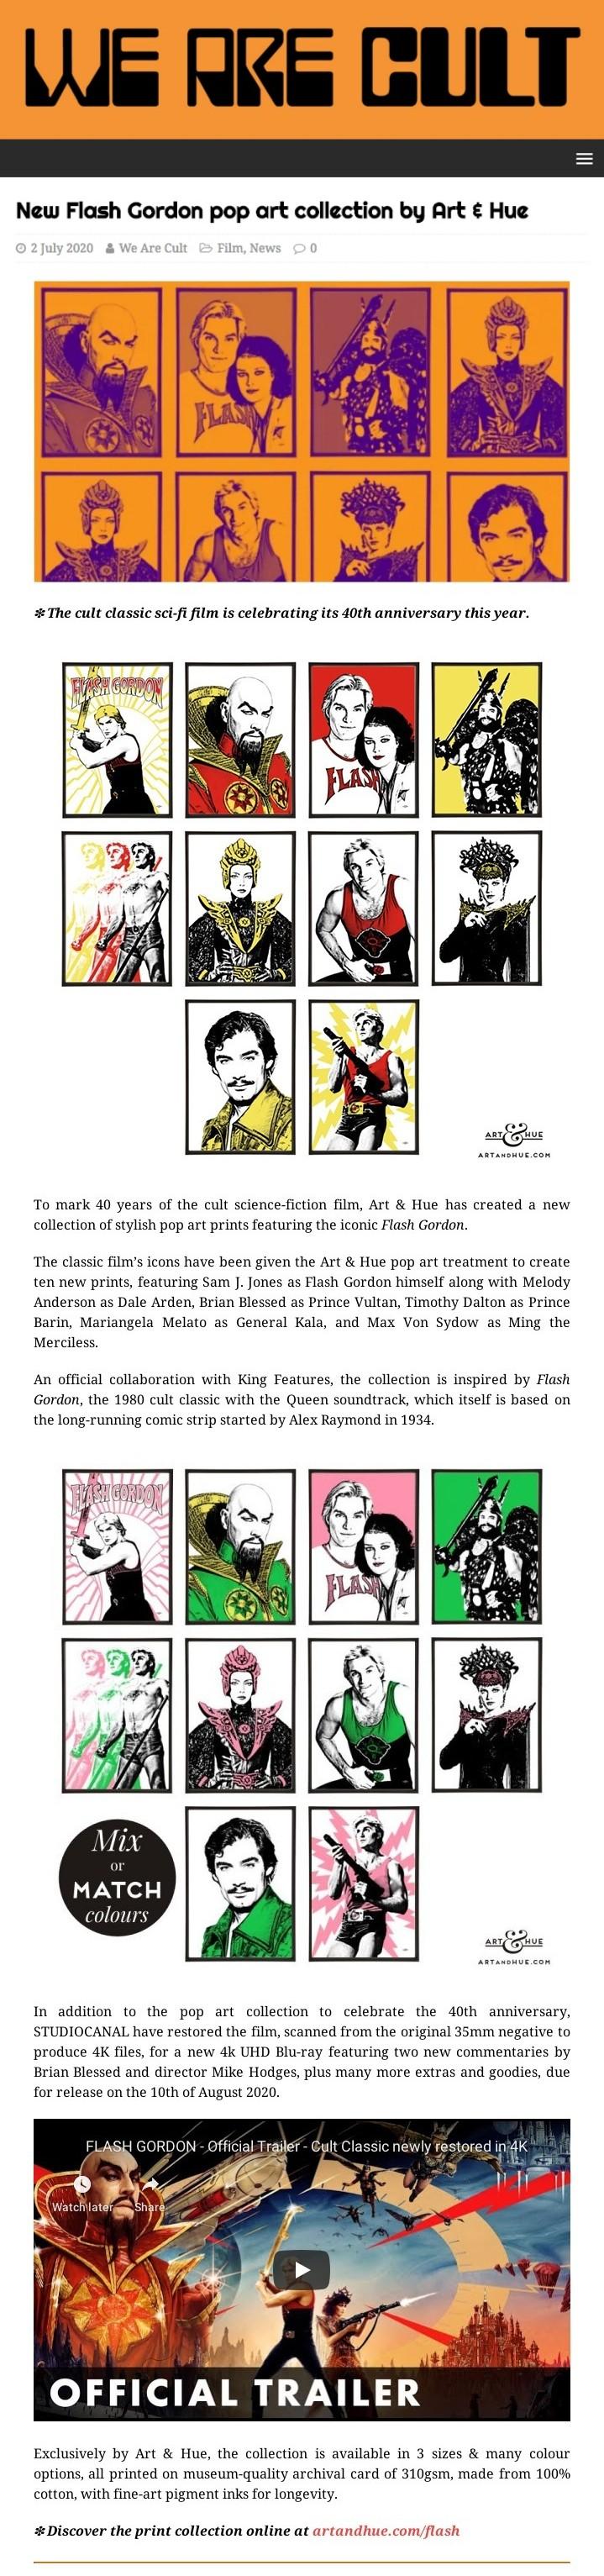 We Are Cult Flash Gordon pop art